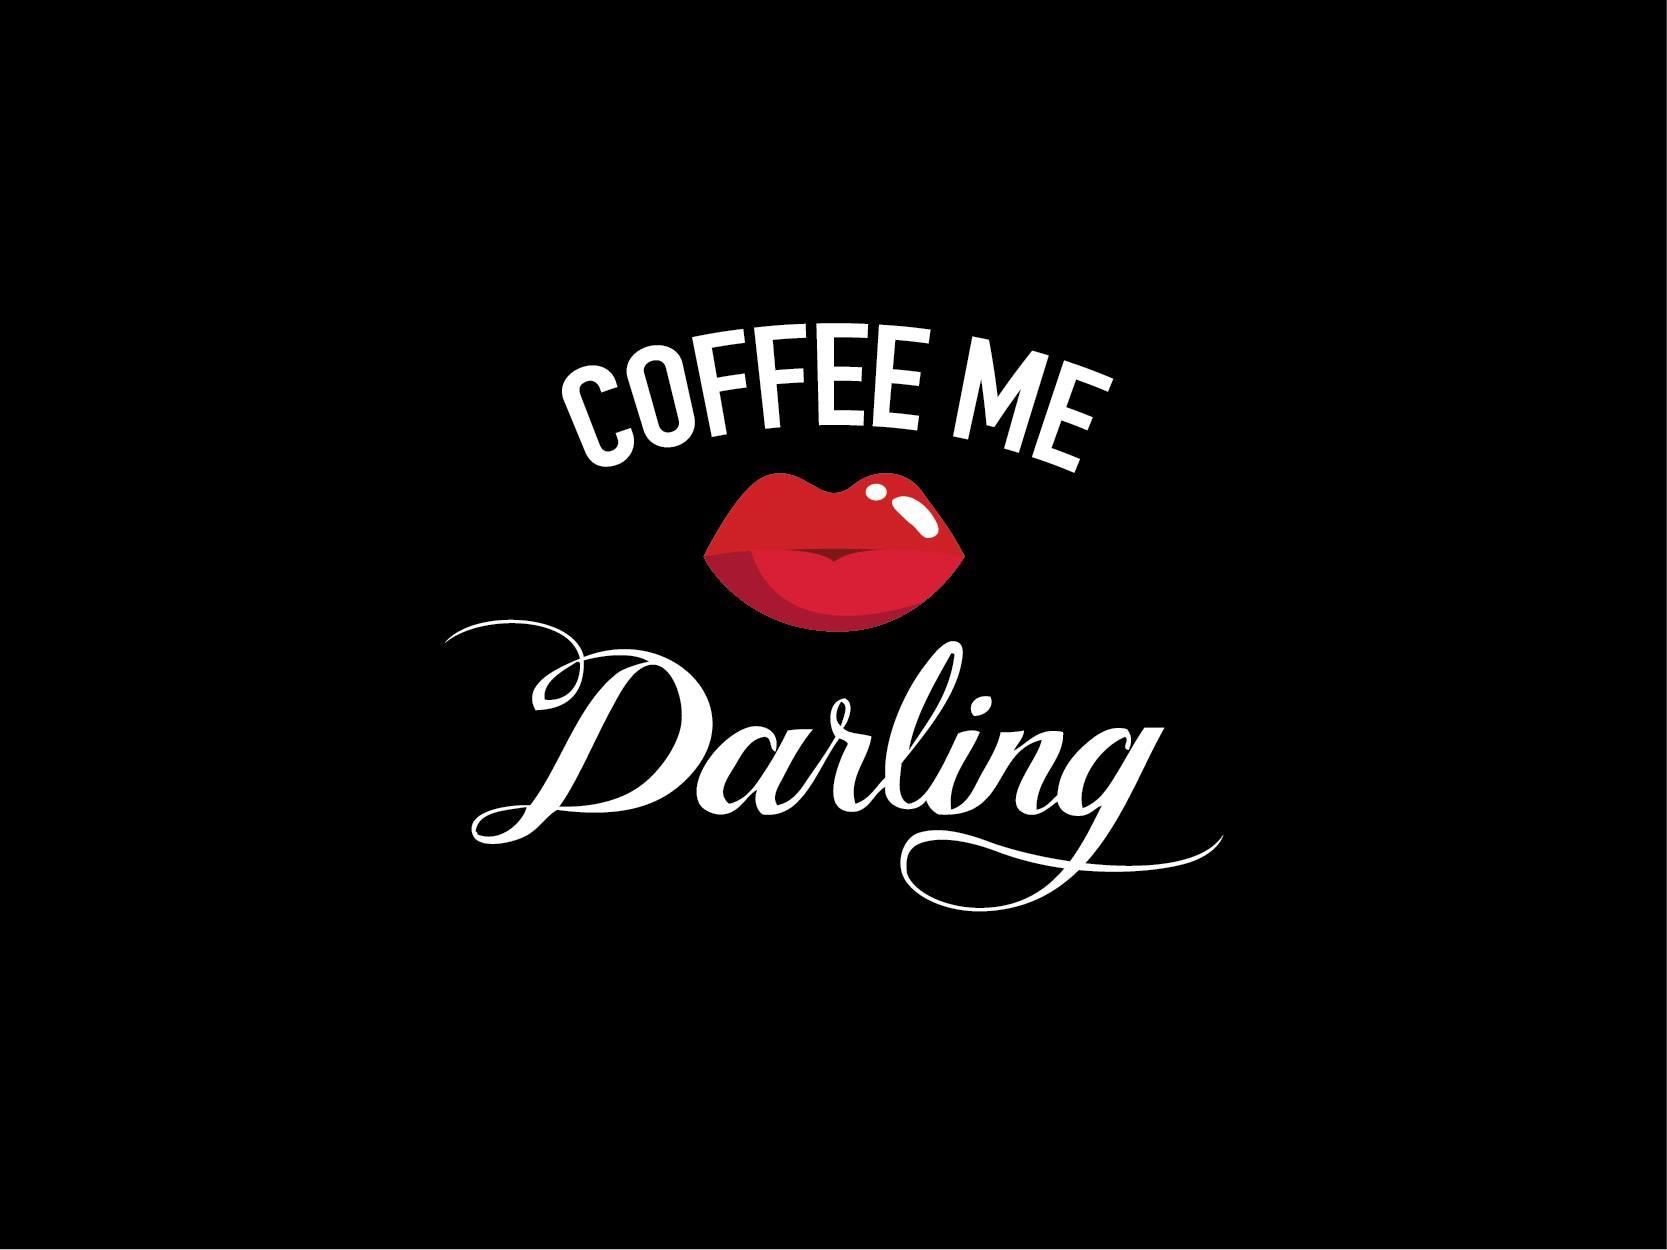 COFFEE ME DARLING